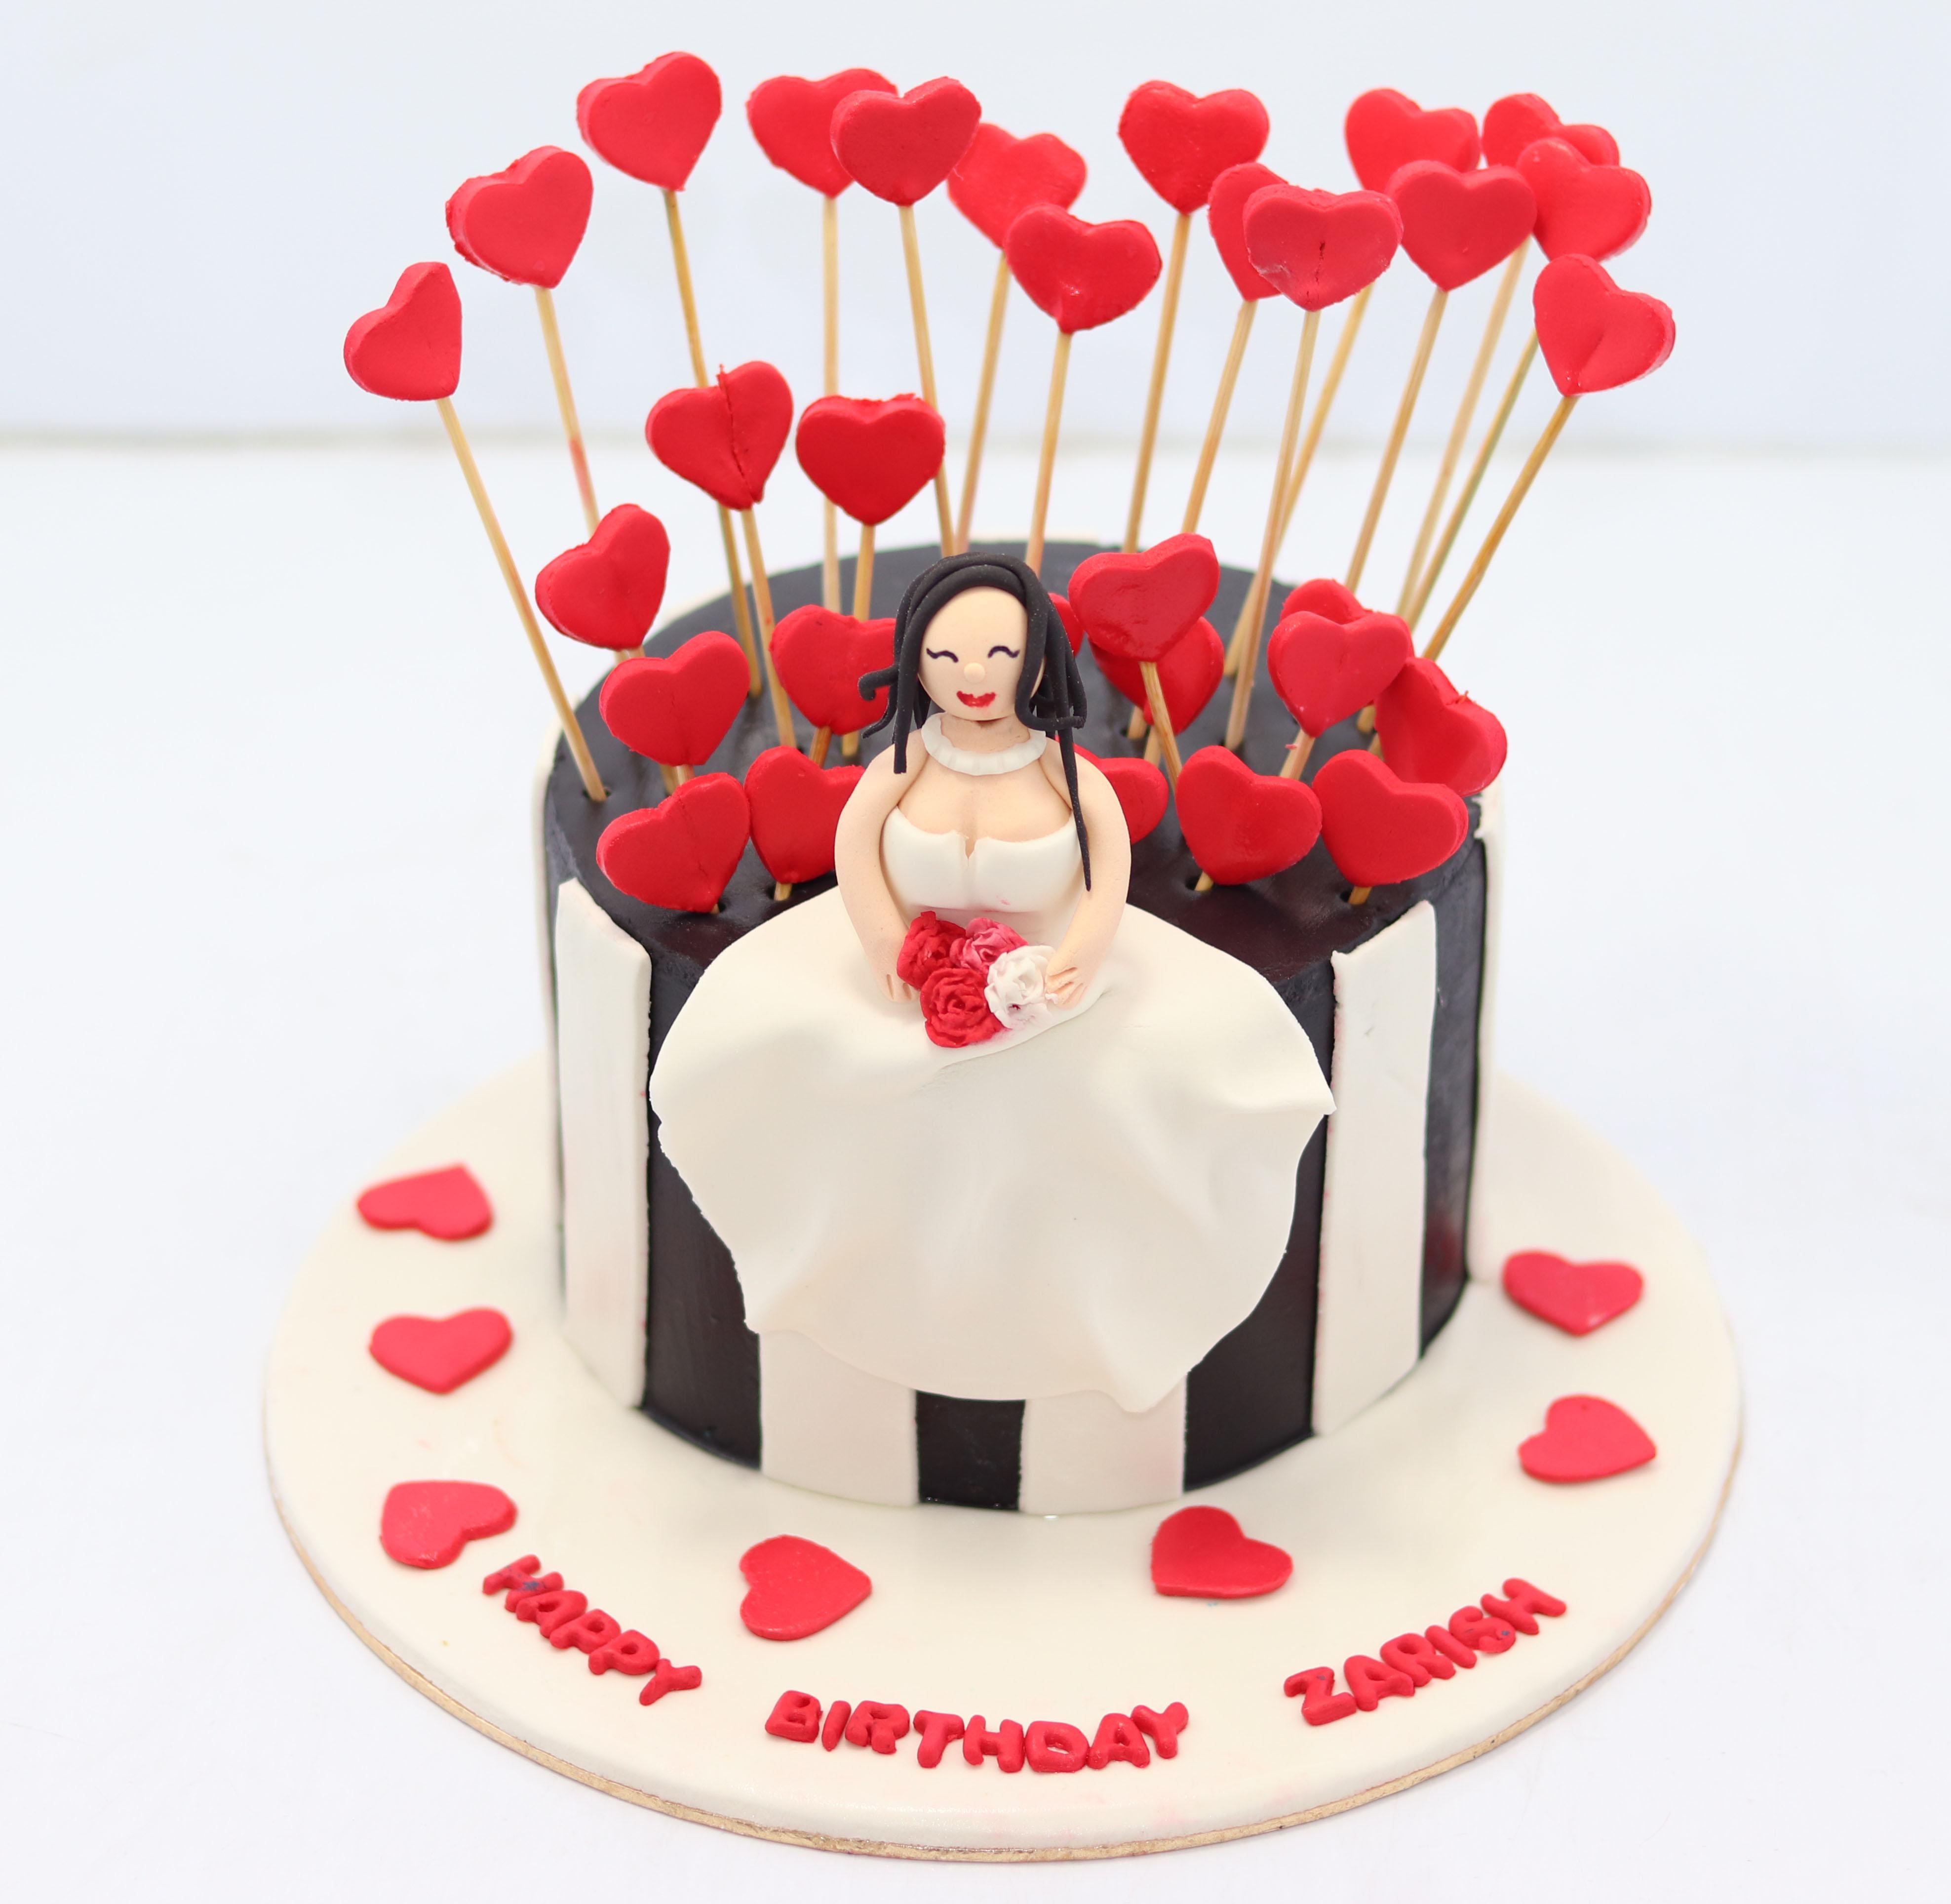 Stupendous Princess Birthday Cake Cake Ideas For Girls In Lahore Funny Birthday Cards Online Elaedamsfinfo